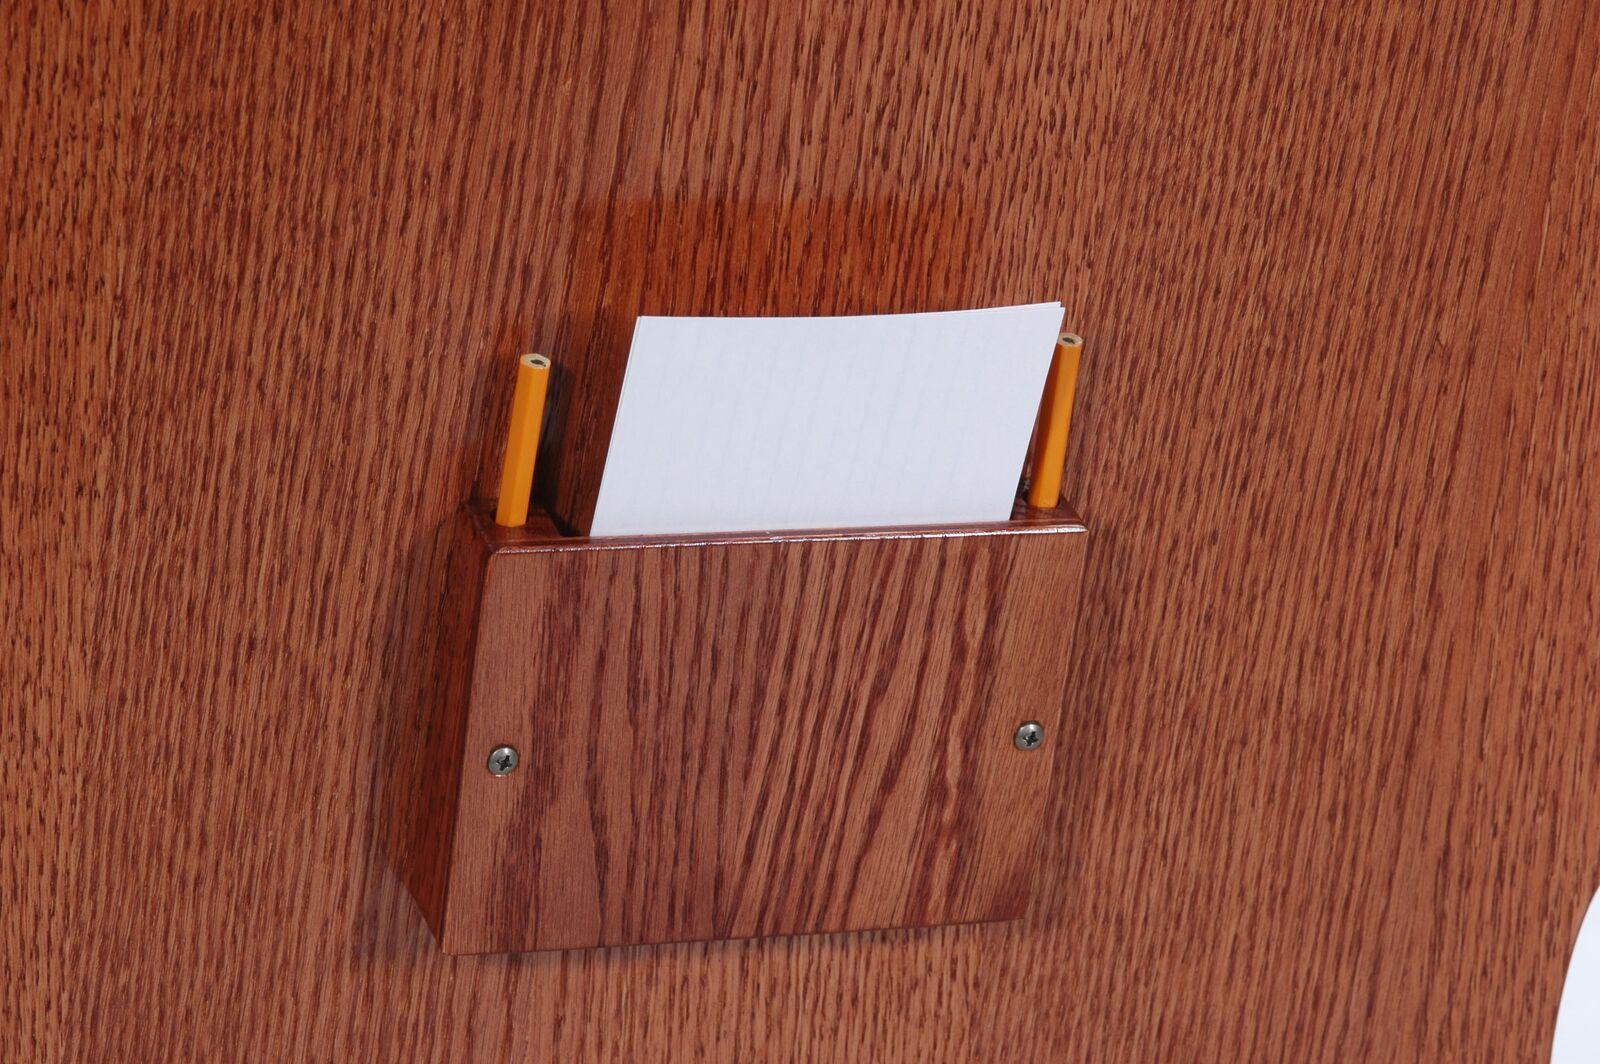 https://www.stiglerprinting.com/images/products_gallery_images/5_b_Wood_Card_Pencil_Holder_.jpg